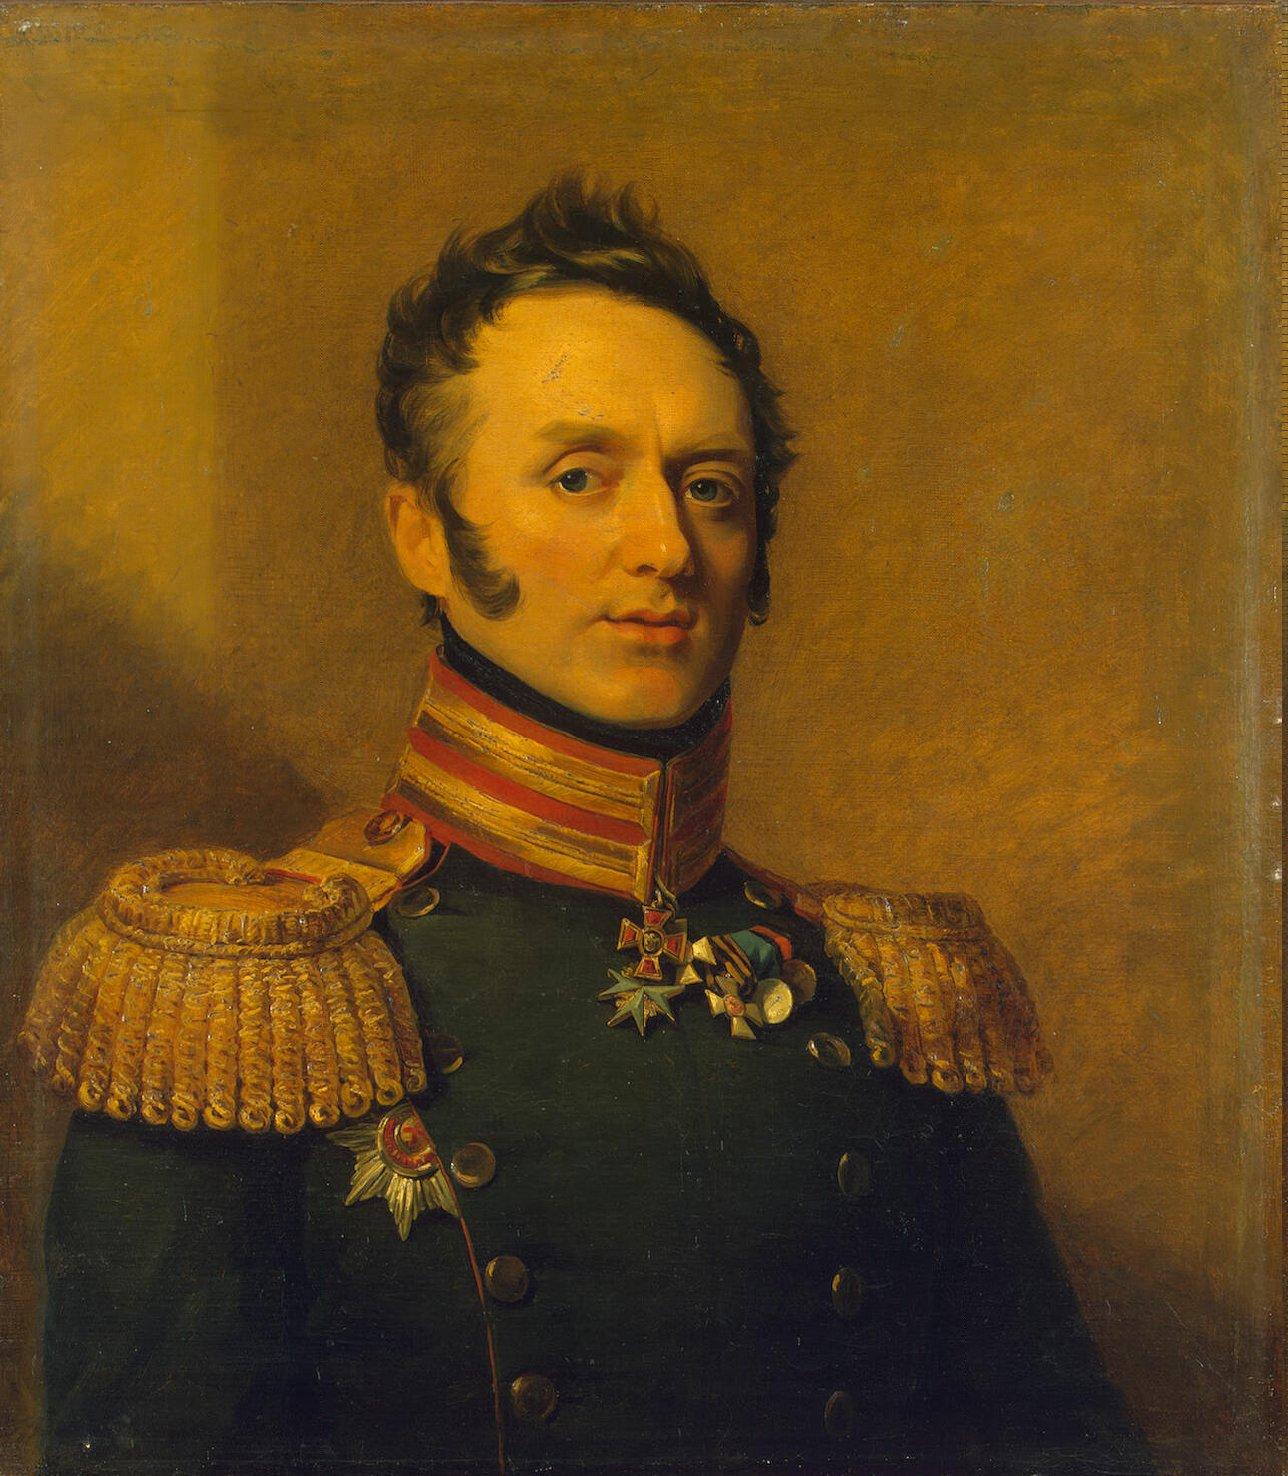 Удом, Иван Фёдорович